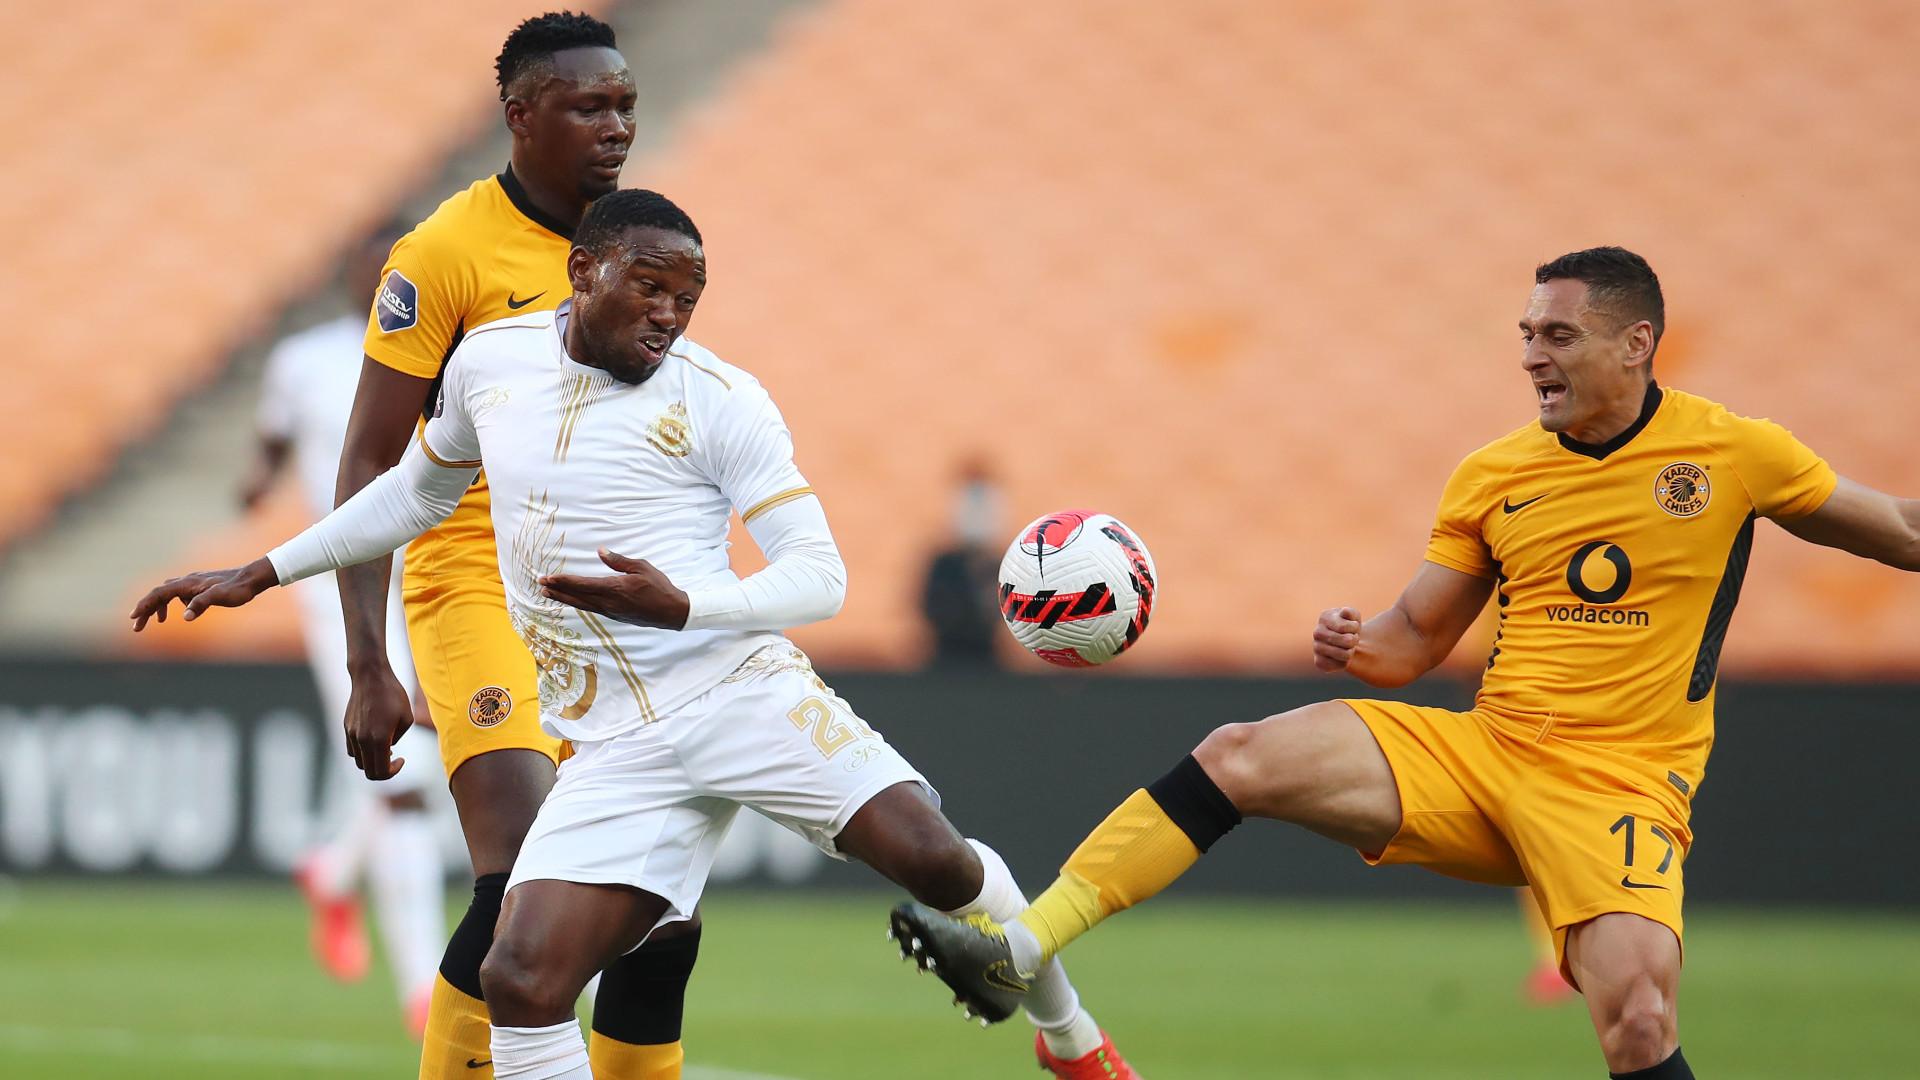 Kaizer Chiefs slayer Letsoalo aiming to match ex-Orlando Pirates forward